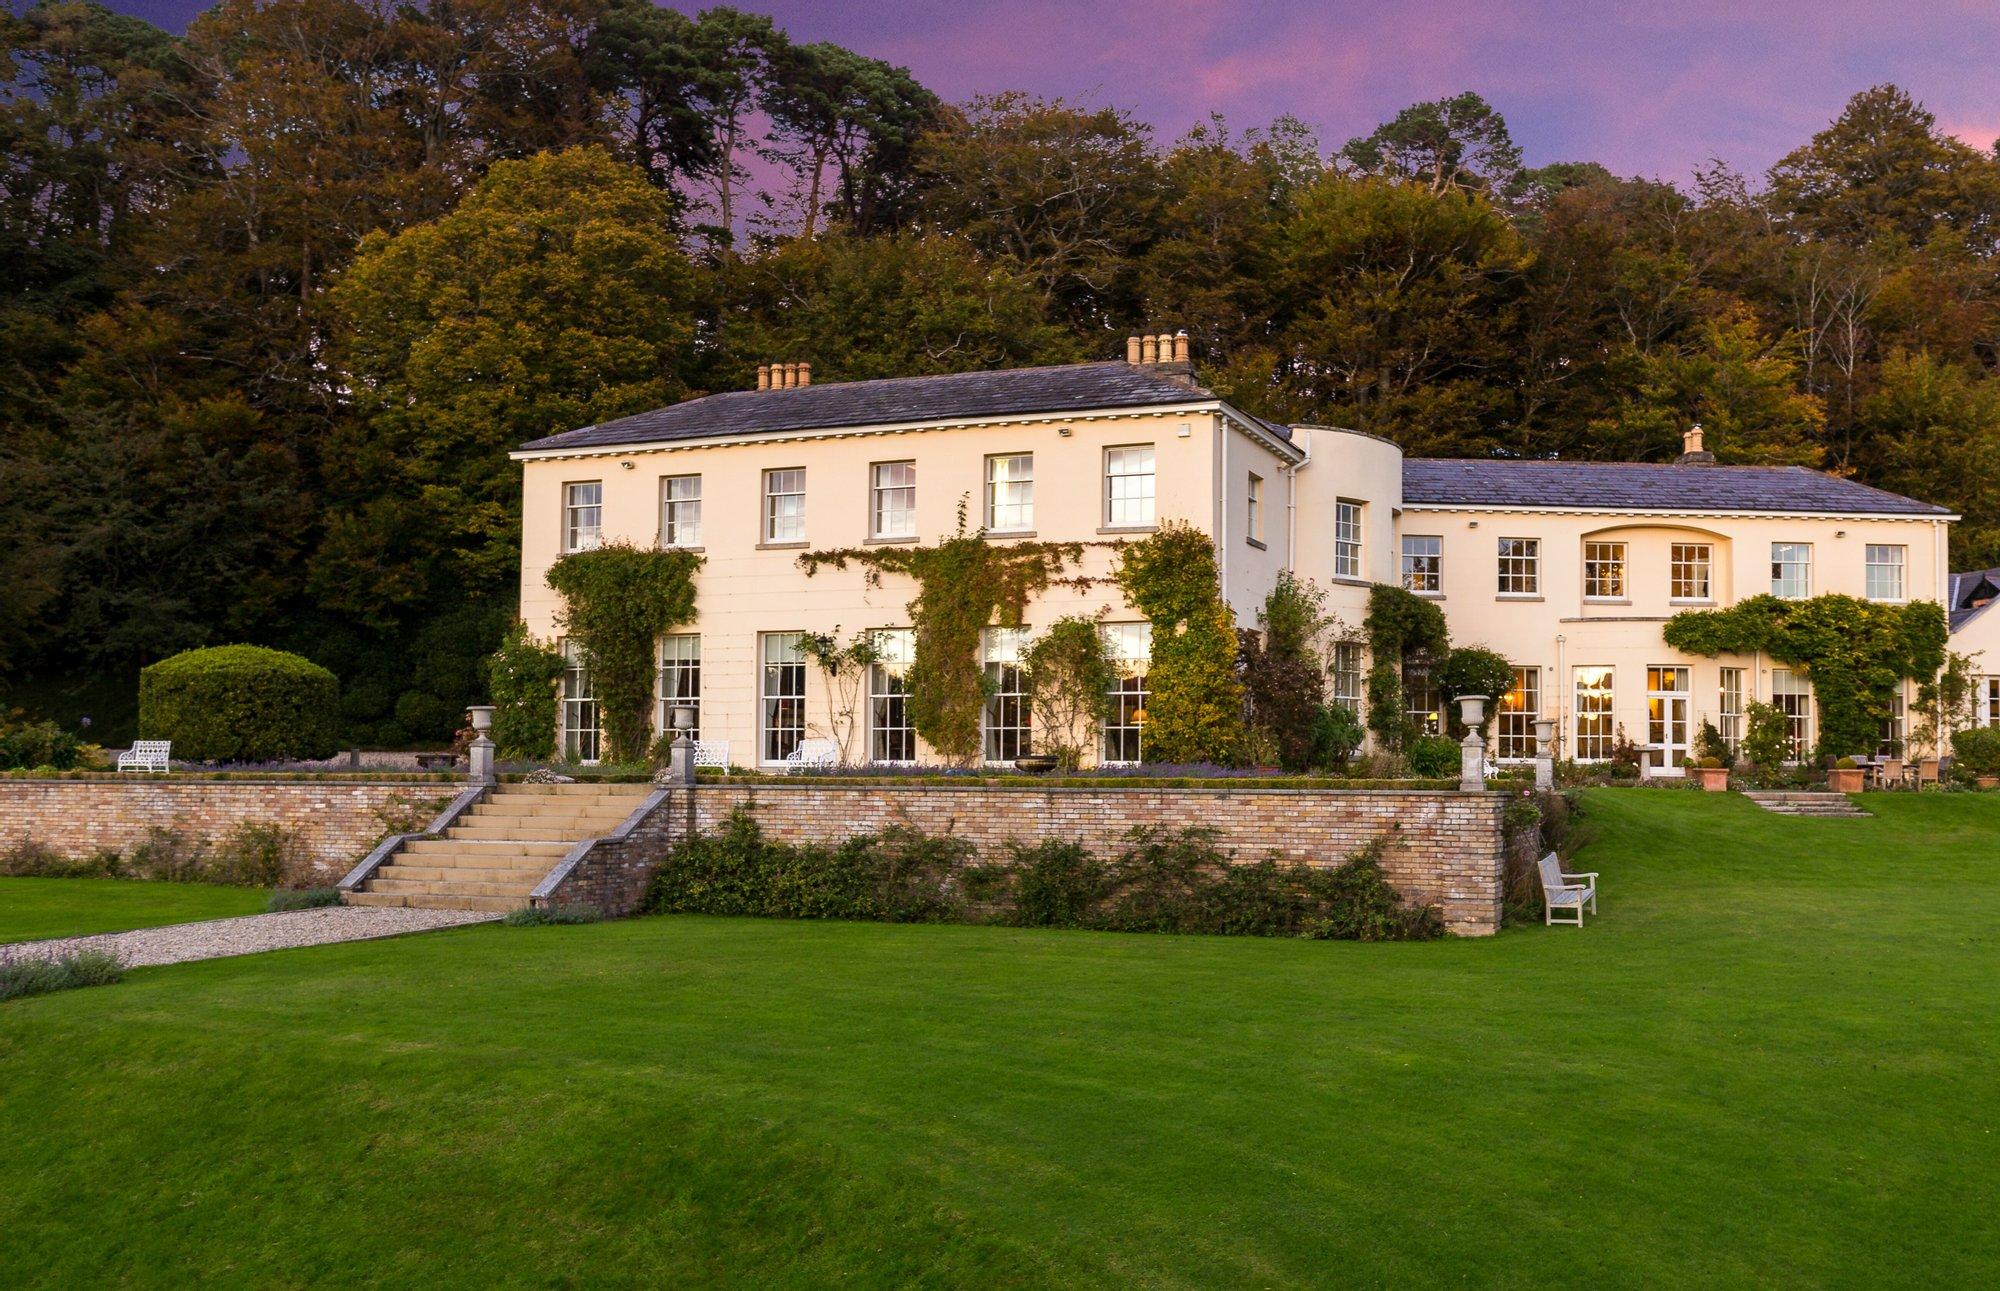 County Wicklow, Ireland 1 - 10526181